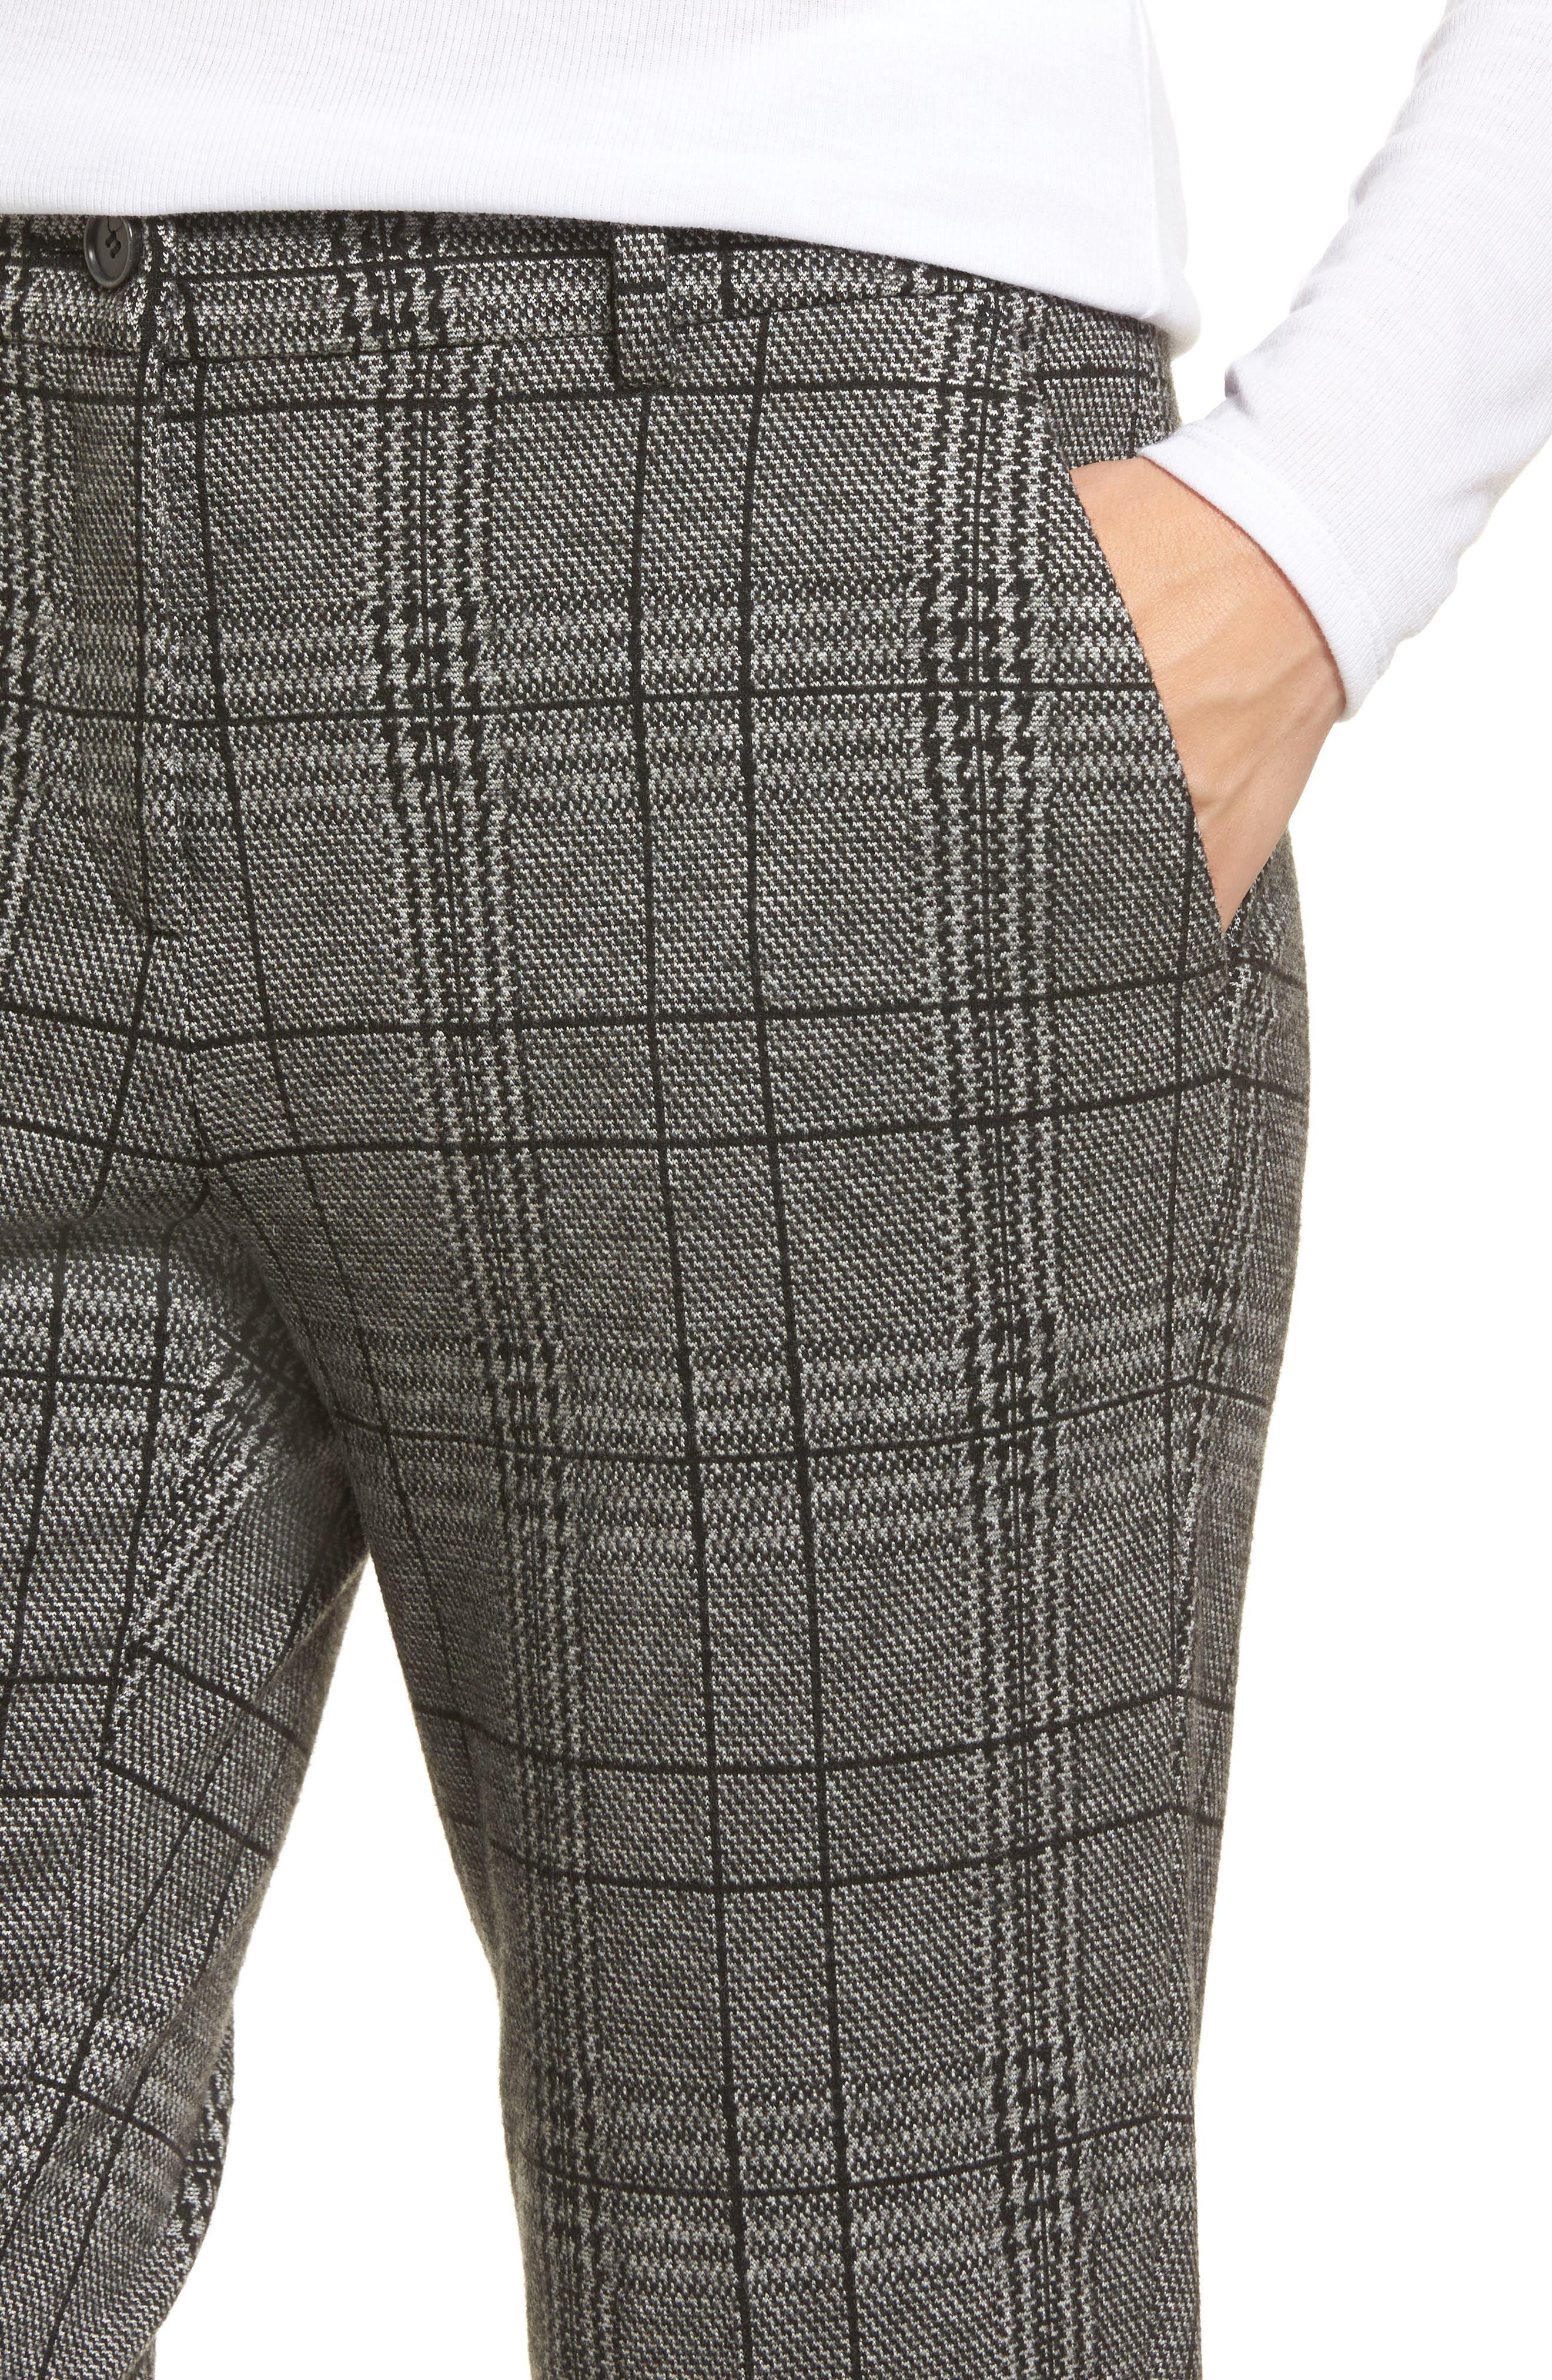 Check Plaid Trousers,                             Alternate thumbnail 4, color,                             002